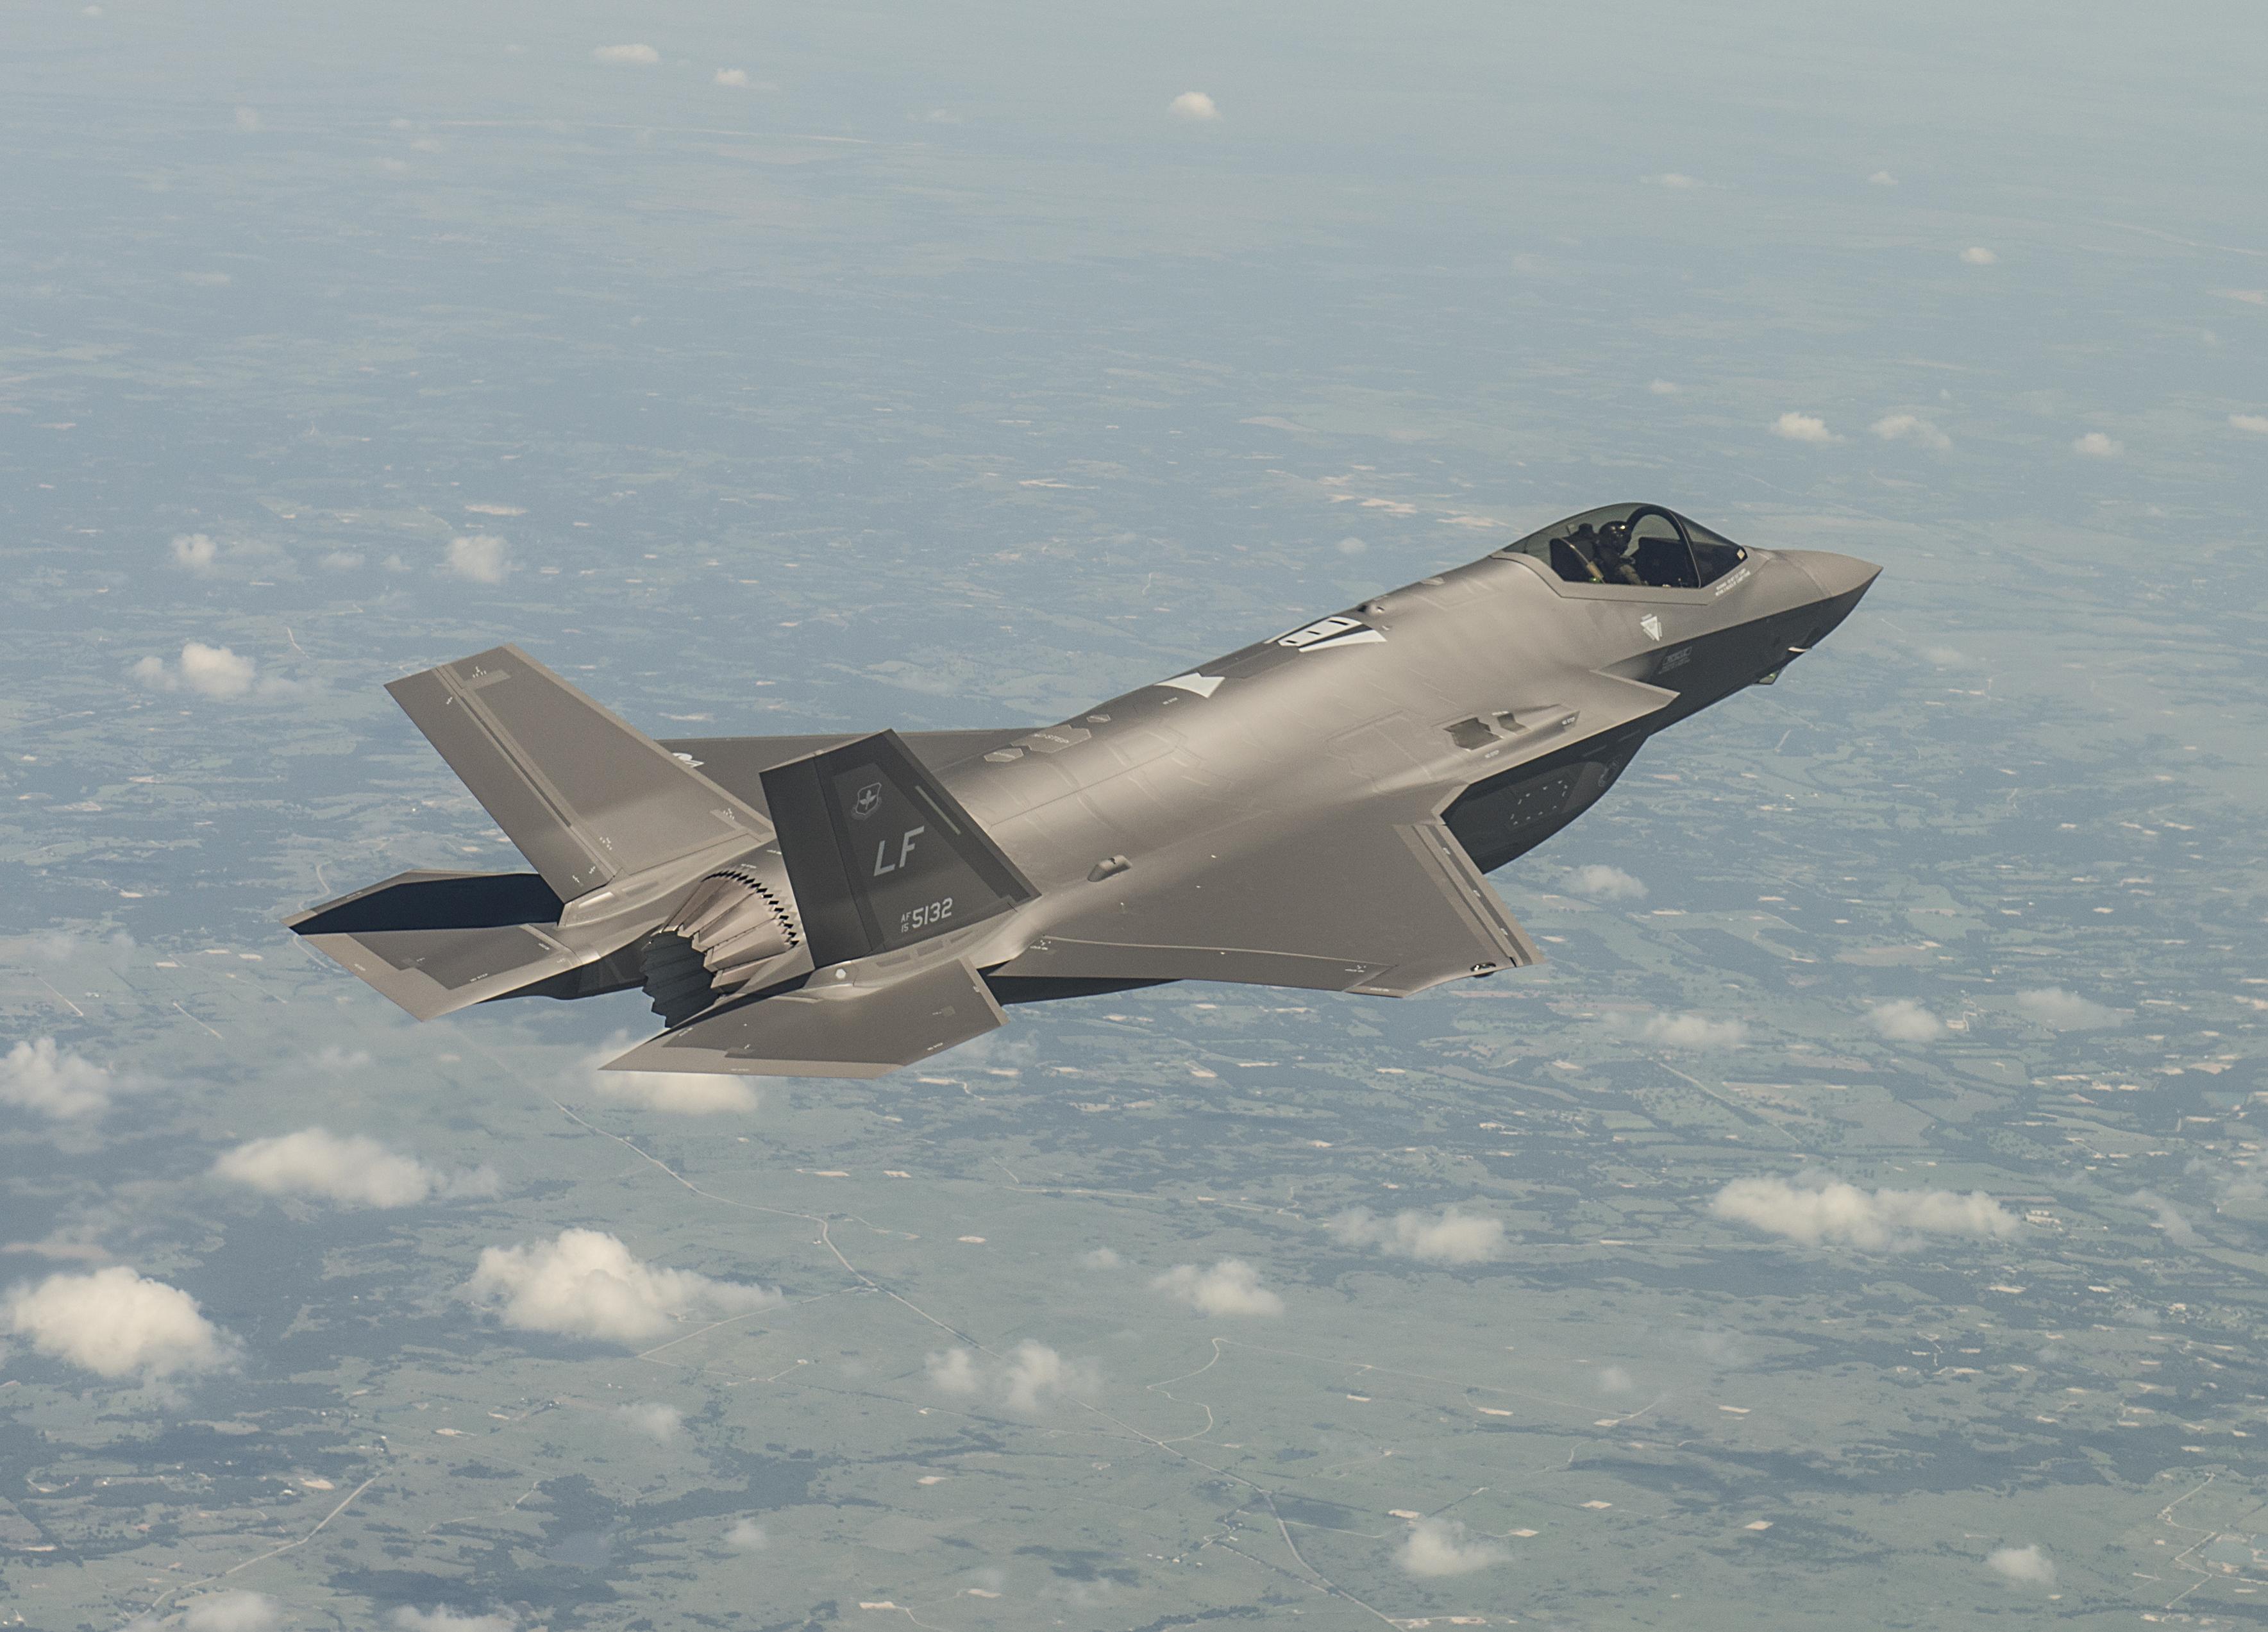 Better Buy General Dynamics Corporation Vs Lockheed Martin The